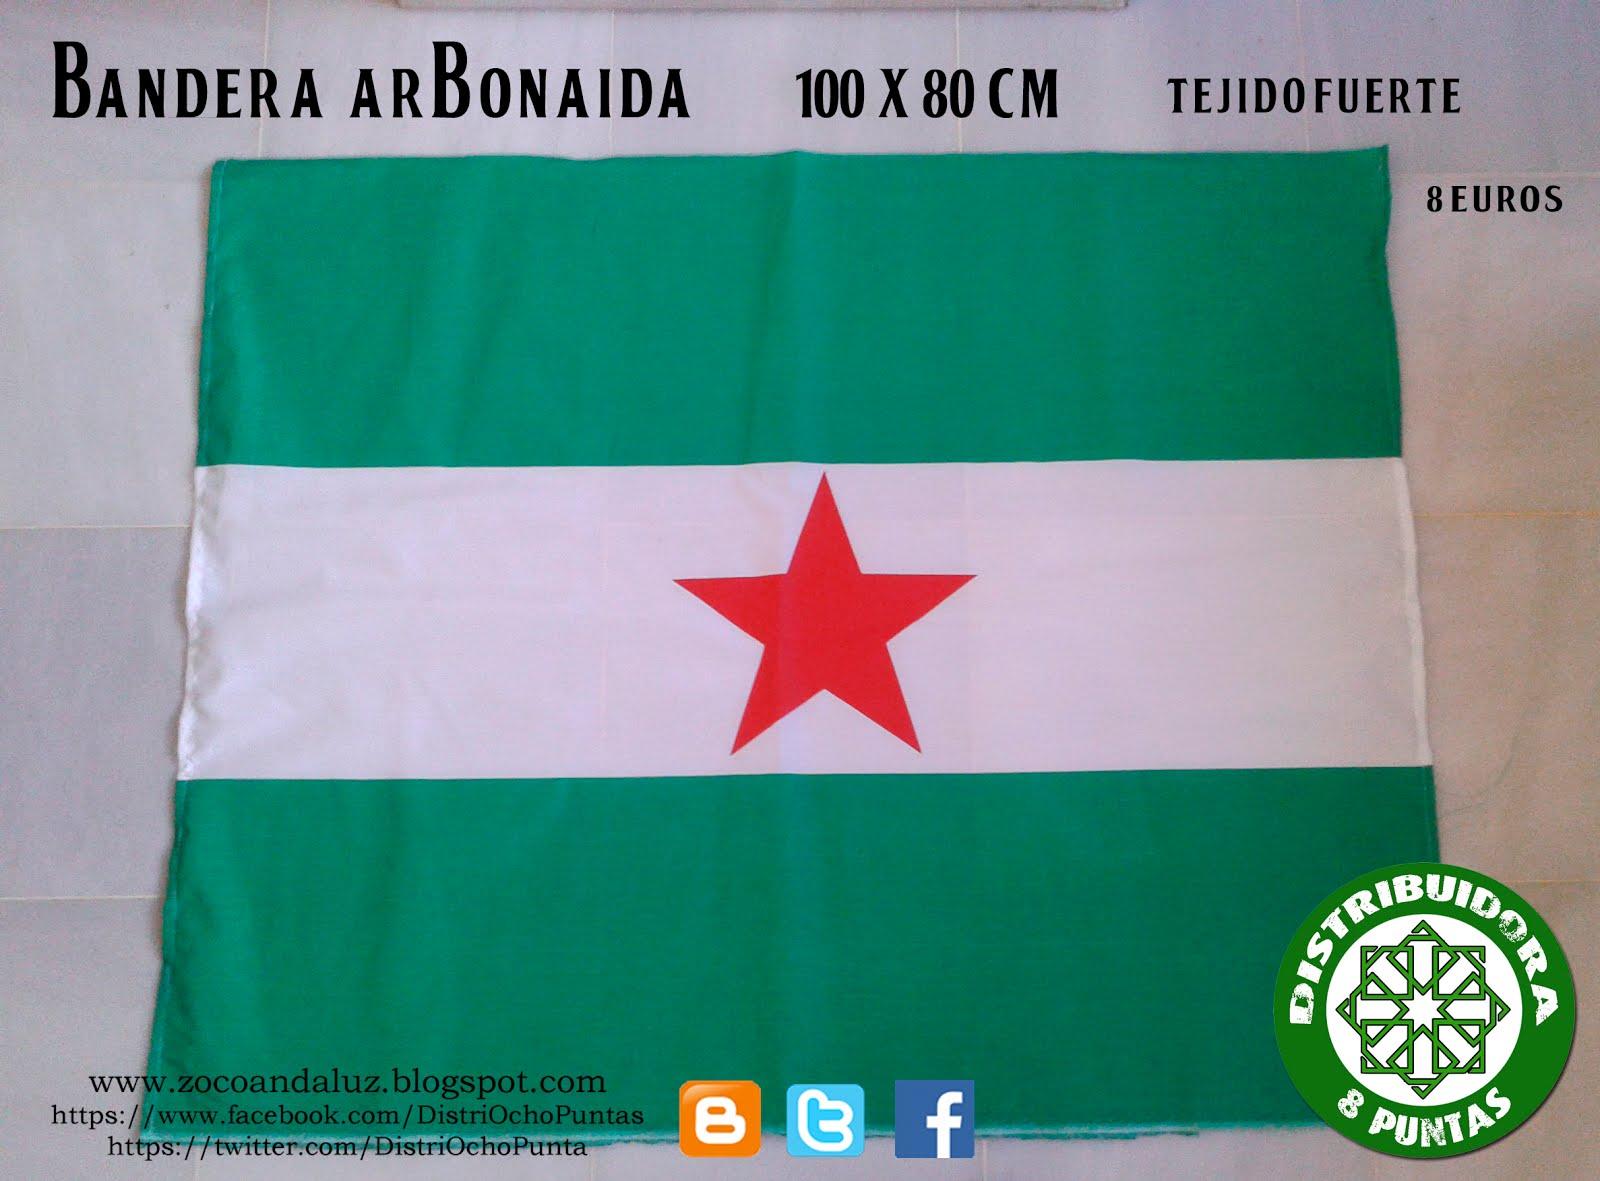 Bandera Arbonaida